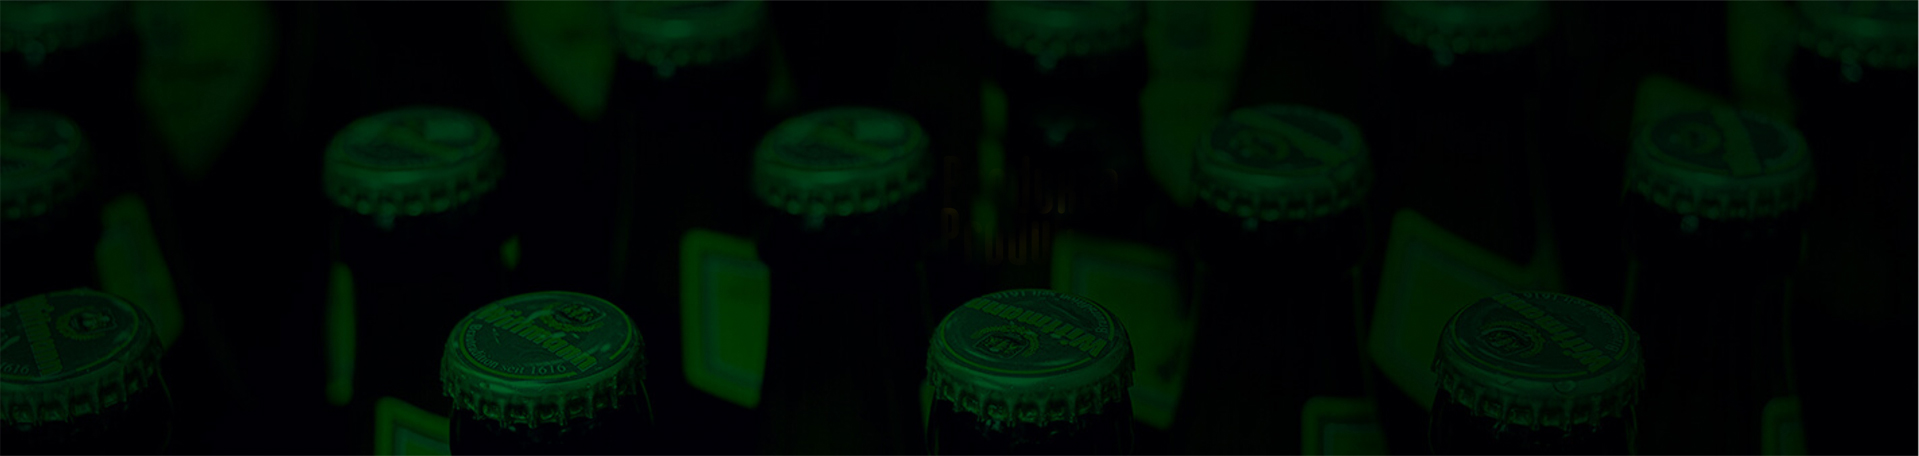 Untergärige Biere